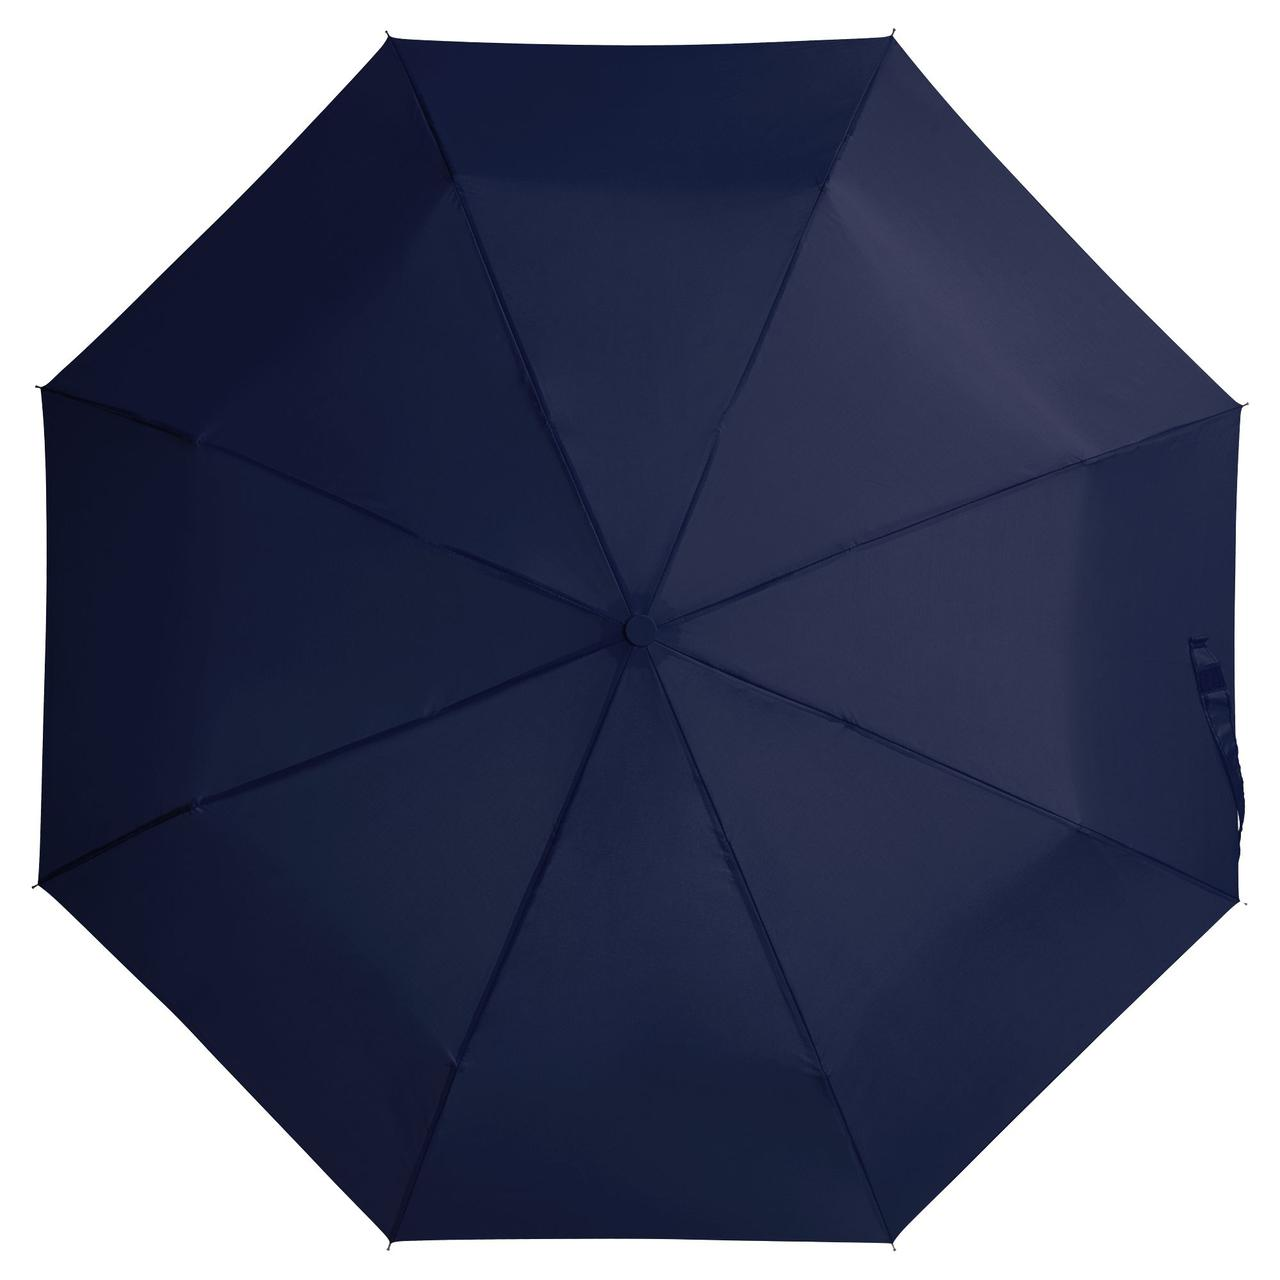 Зонт складной Unit Basic, темно-синий (артикул 5527.42)